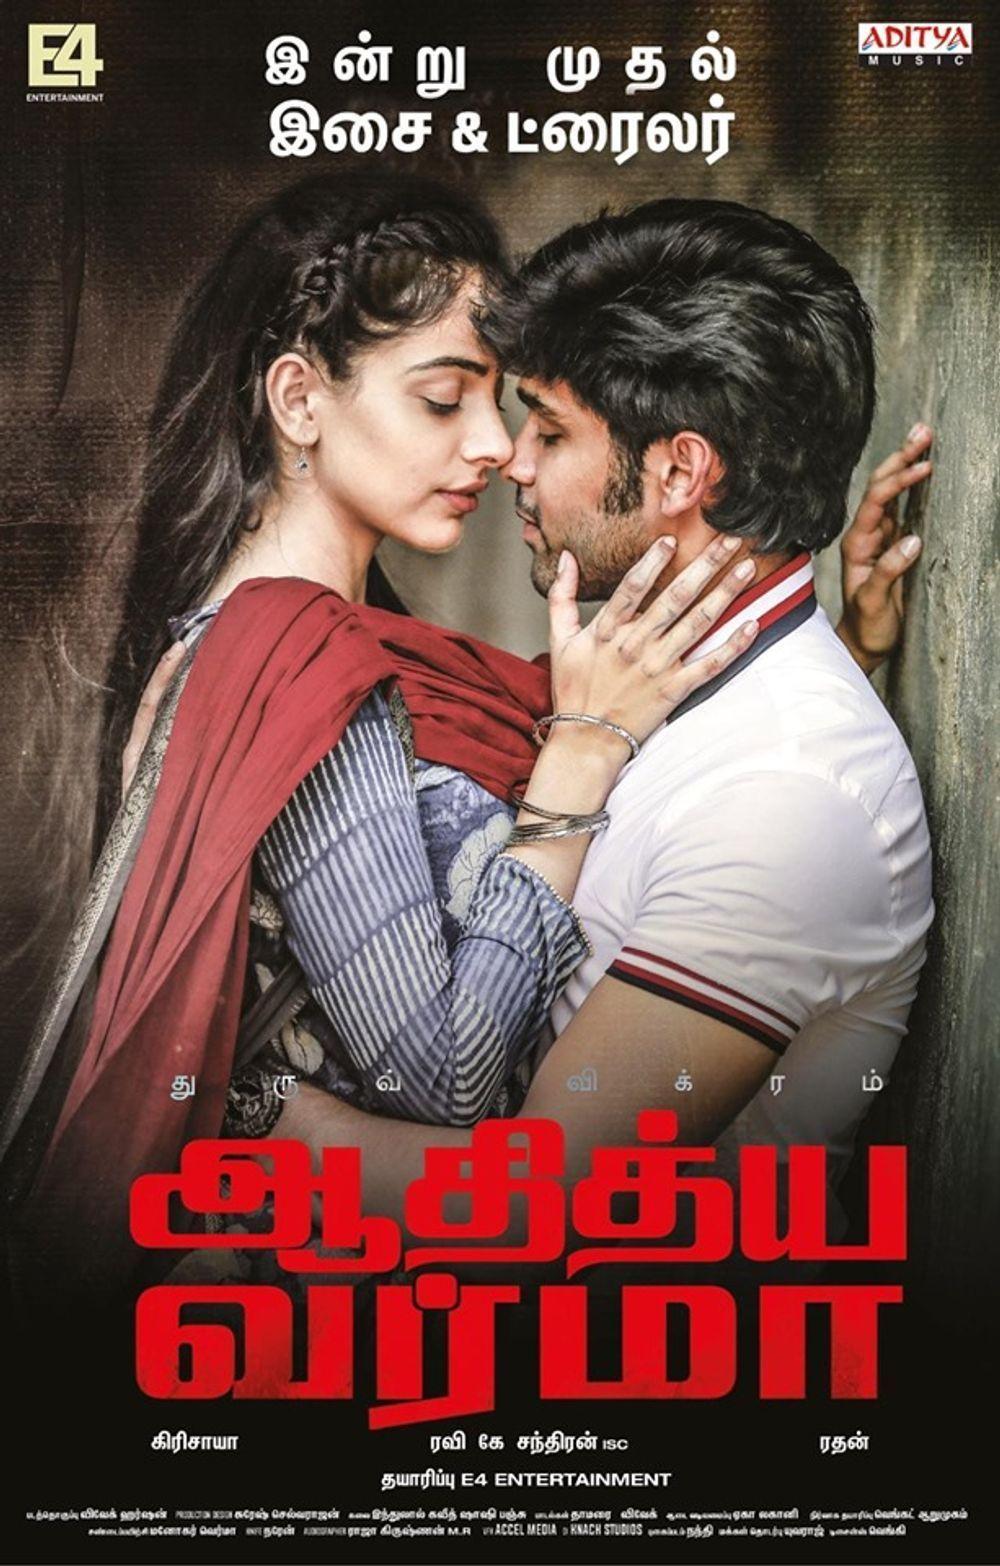 Adithya Varma Movie Latest Hd Photos Posters Wallpapers Download 1080p 4k 74063 Adithyavarma Kollywood Dhruvvikr Hd Photos Good Movies Worst Movies